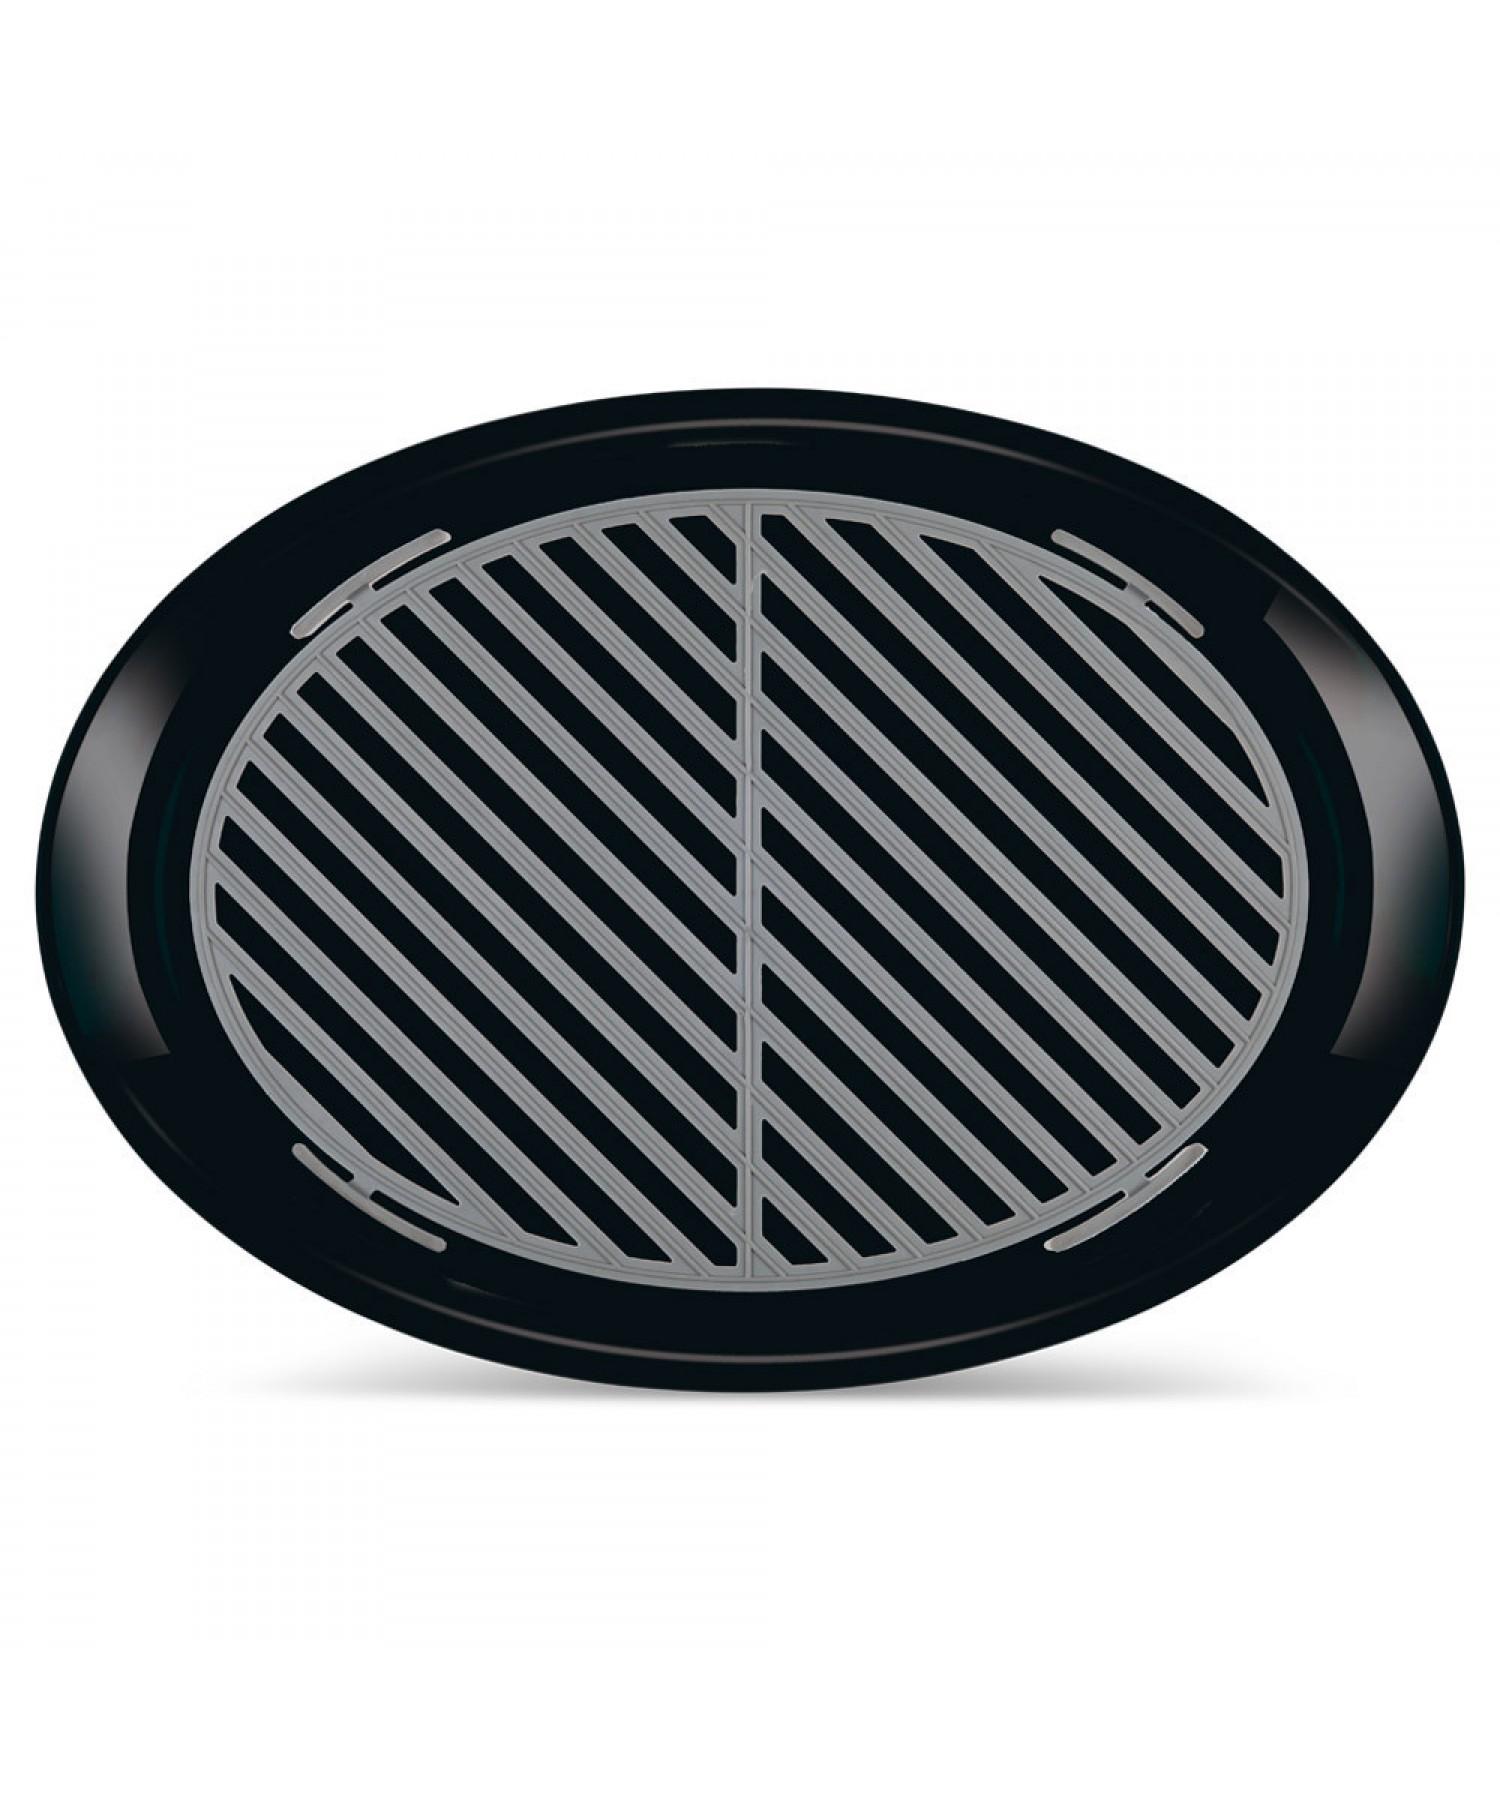 ANTI-SLIP TRAY BLACK OVAL MEDIUM